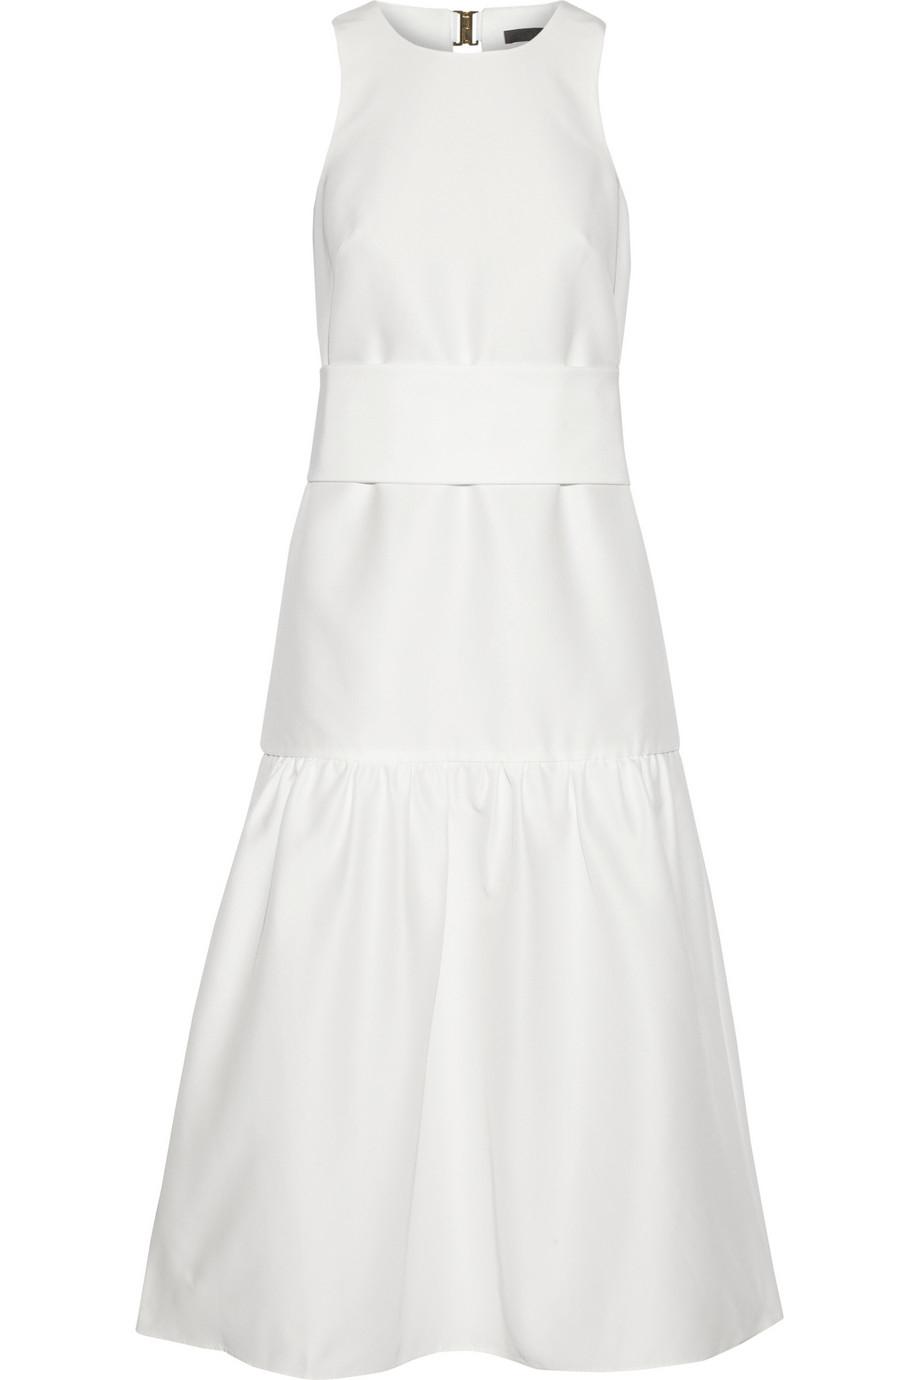 Lyst - Tibi Open-Back Faille Midi Dress in White